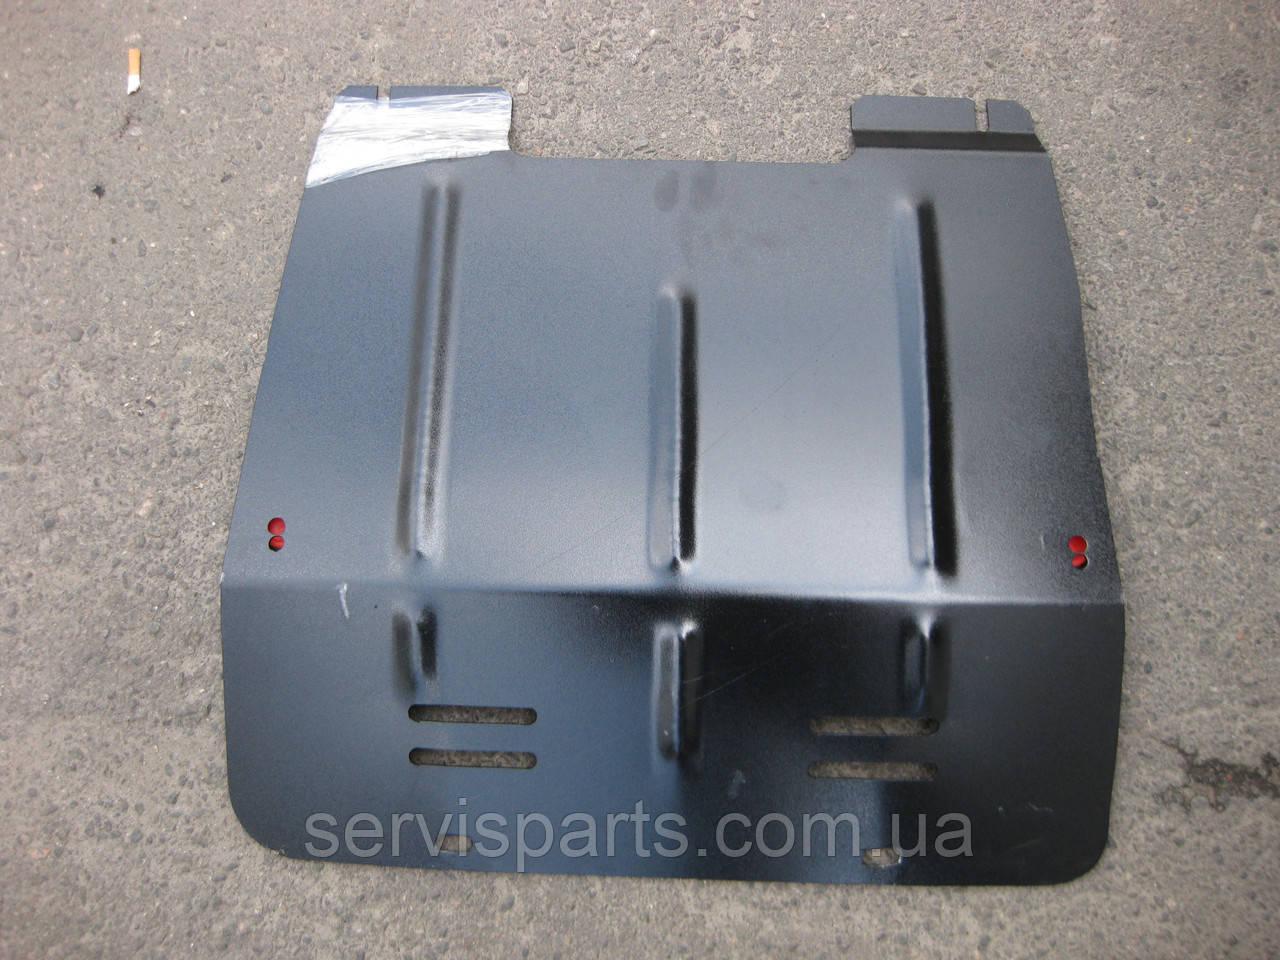 Защита двигателя Renault Kangoo 1998-2008 (Рено Кангу)